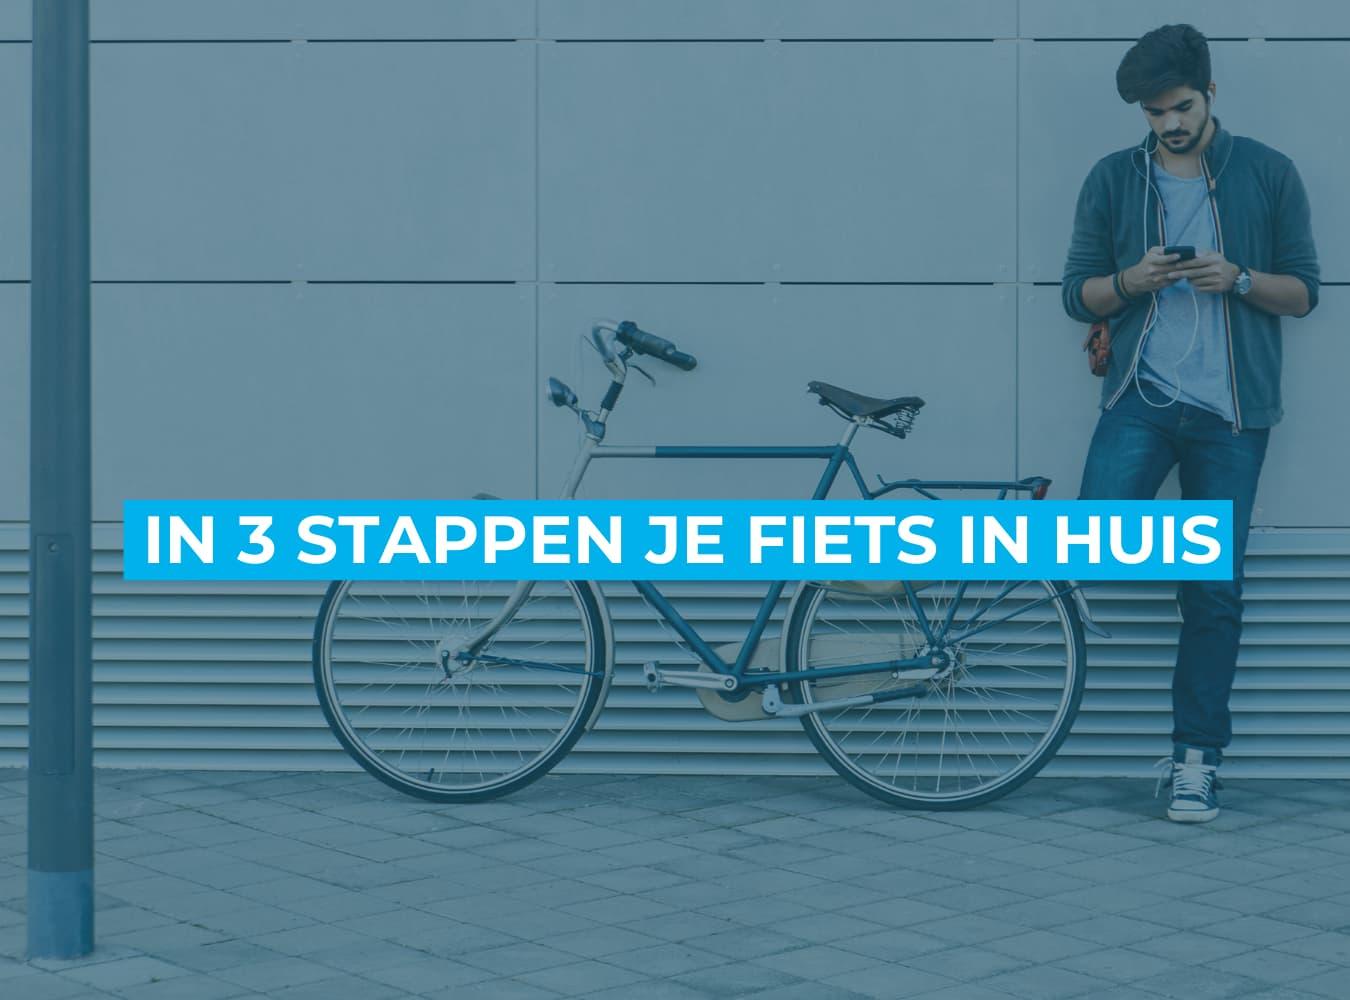 Fiets online bestellen bij Fietsuniek.nl. In 3 stappen je fiets in huis.